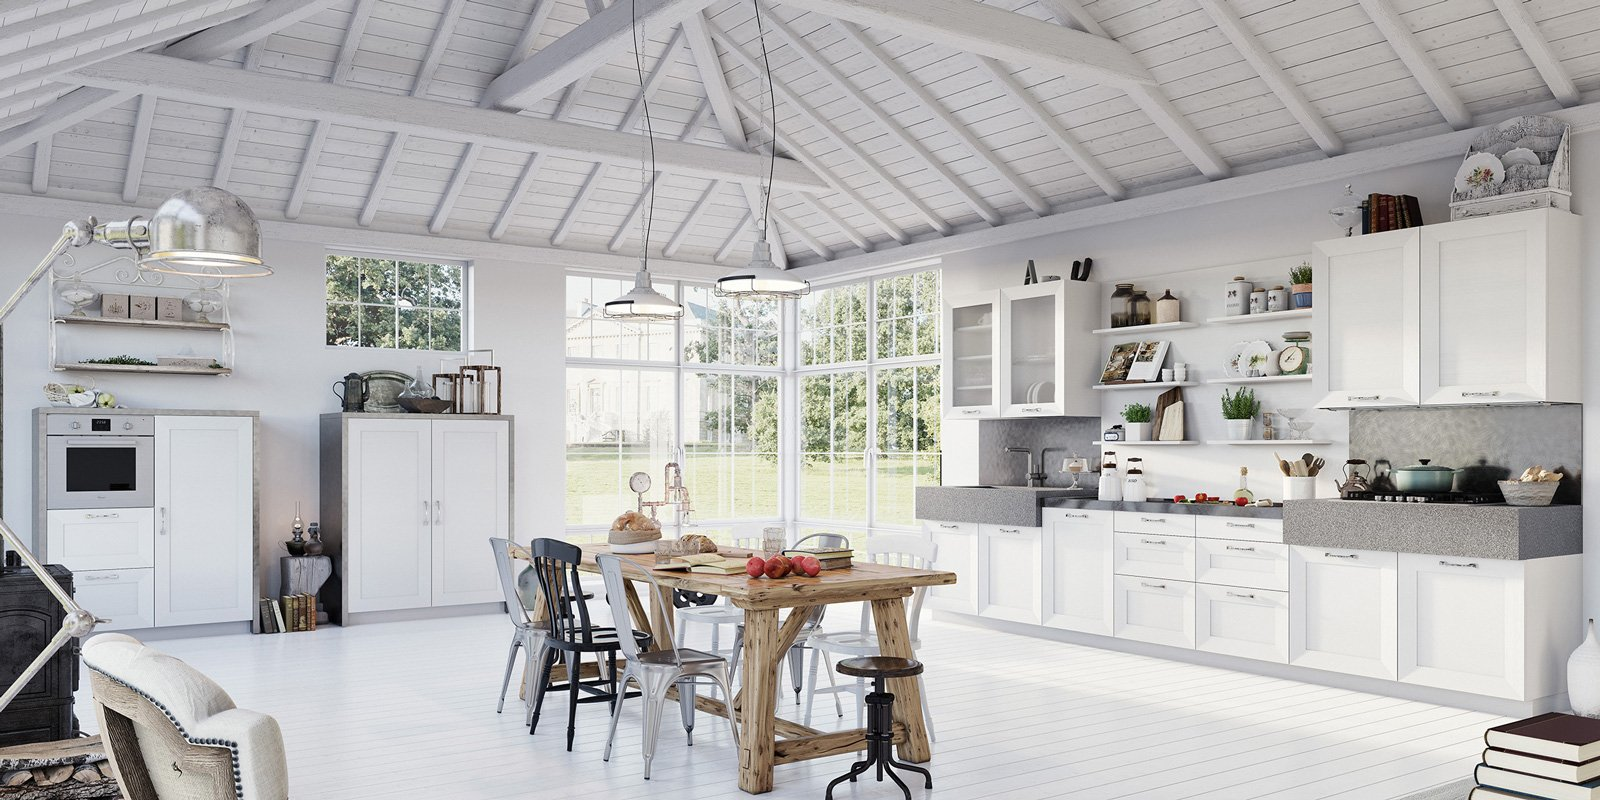 Cucine in legno tradizionali country o moderne cose di - Mensole cucina country ...